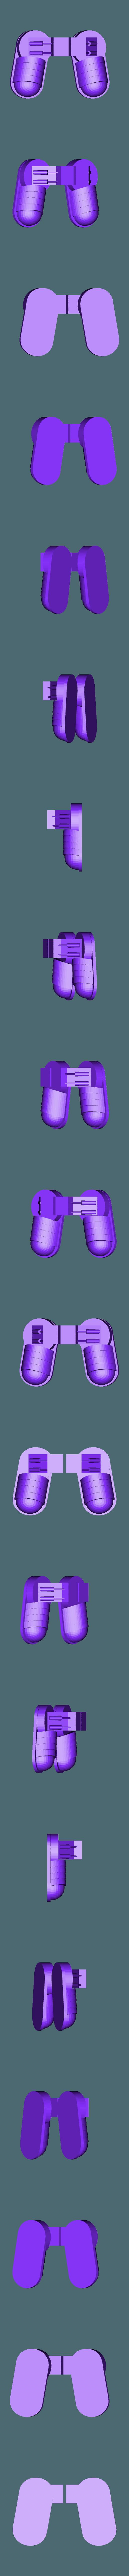 gargant_feet.stl Télécharger fichier STL gratuit Ork Great Gargant 6mm Epic Scale Proxy model • Objet à imprimer en 3D, redstarkits